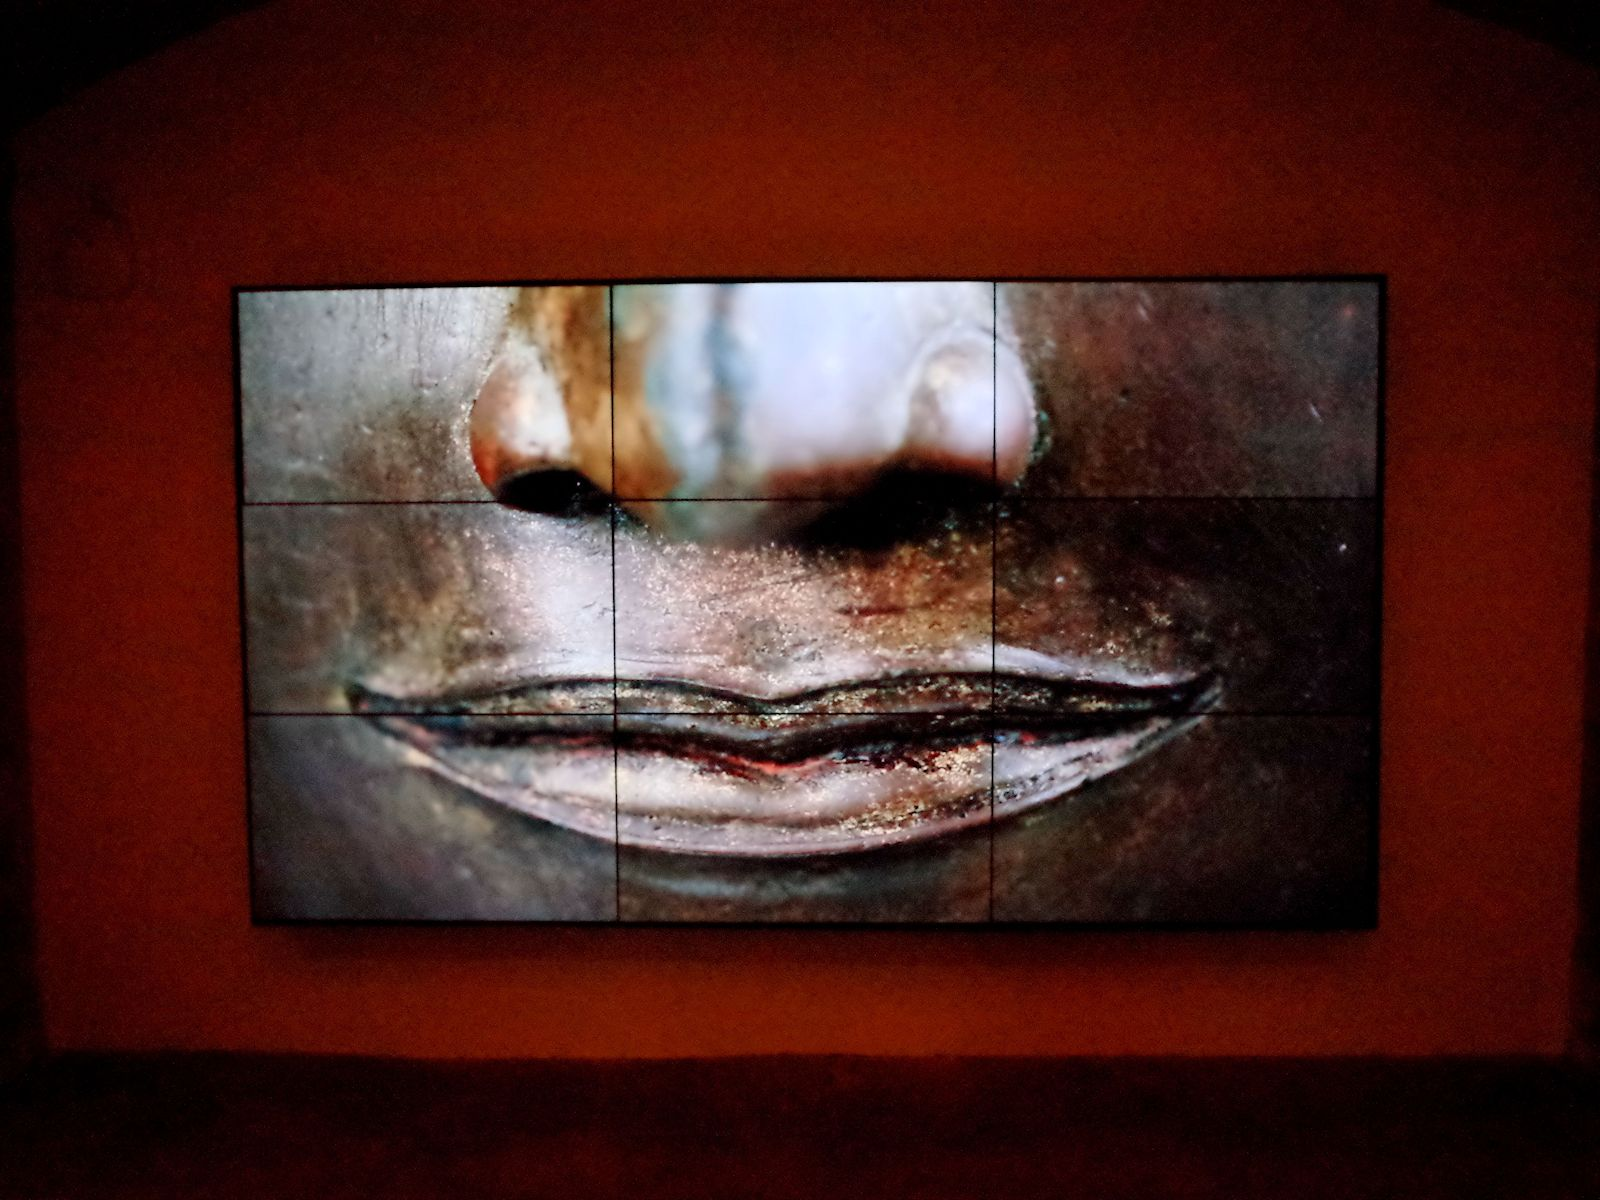 museo-culturas-del-mundo-02